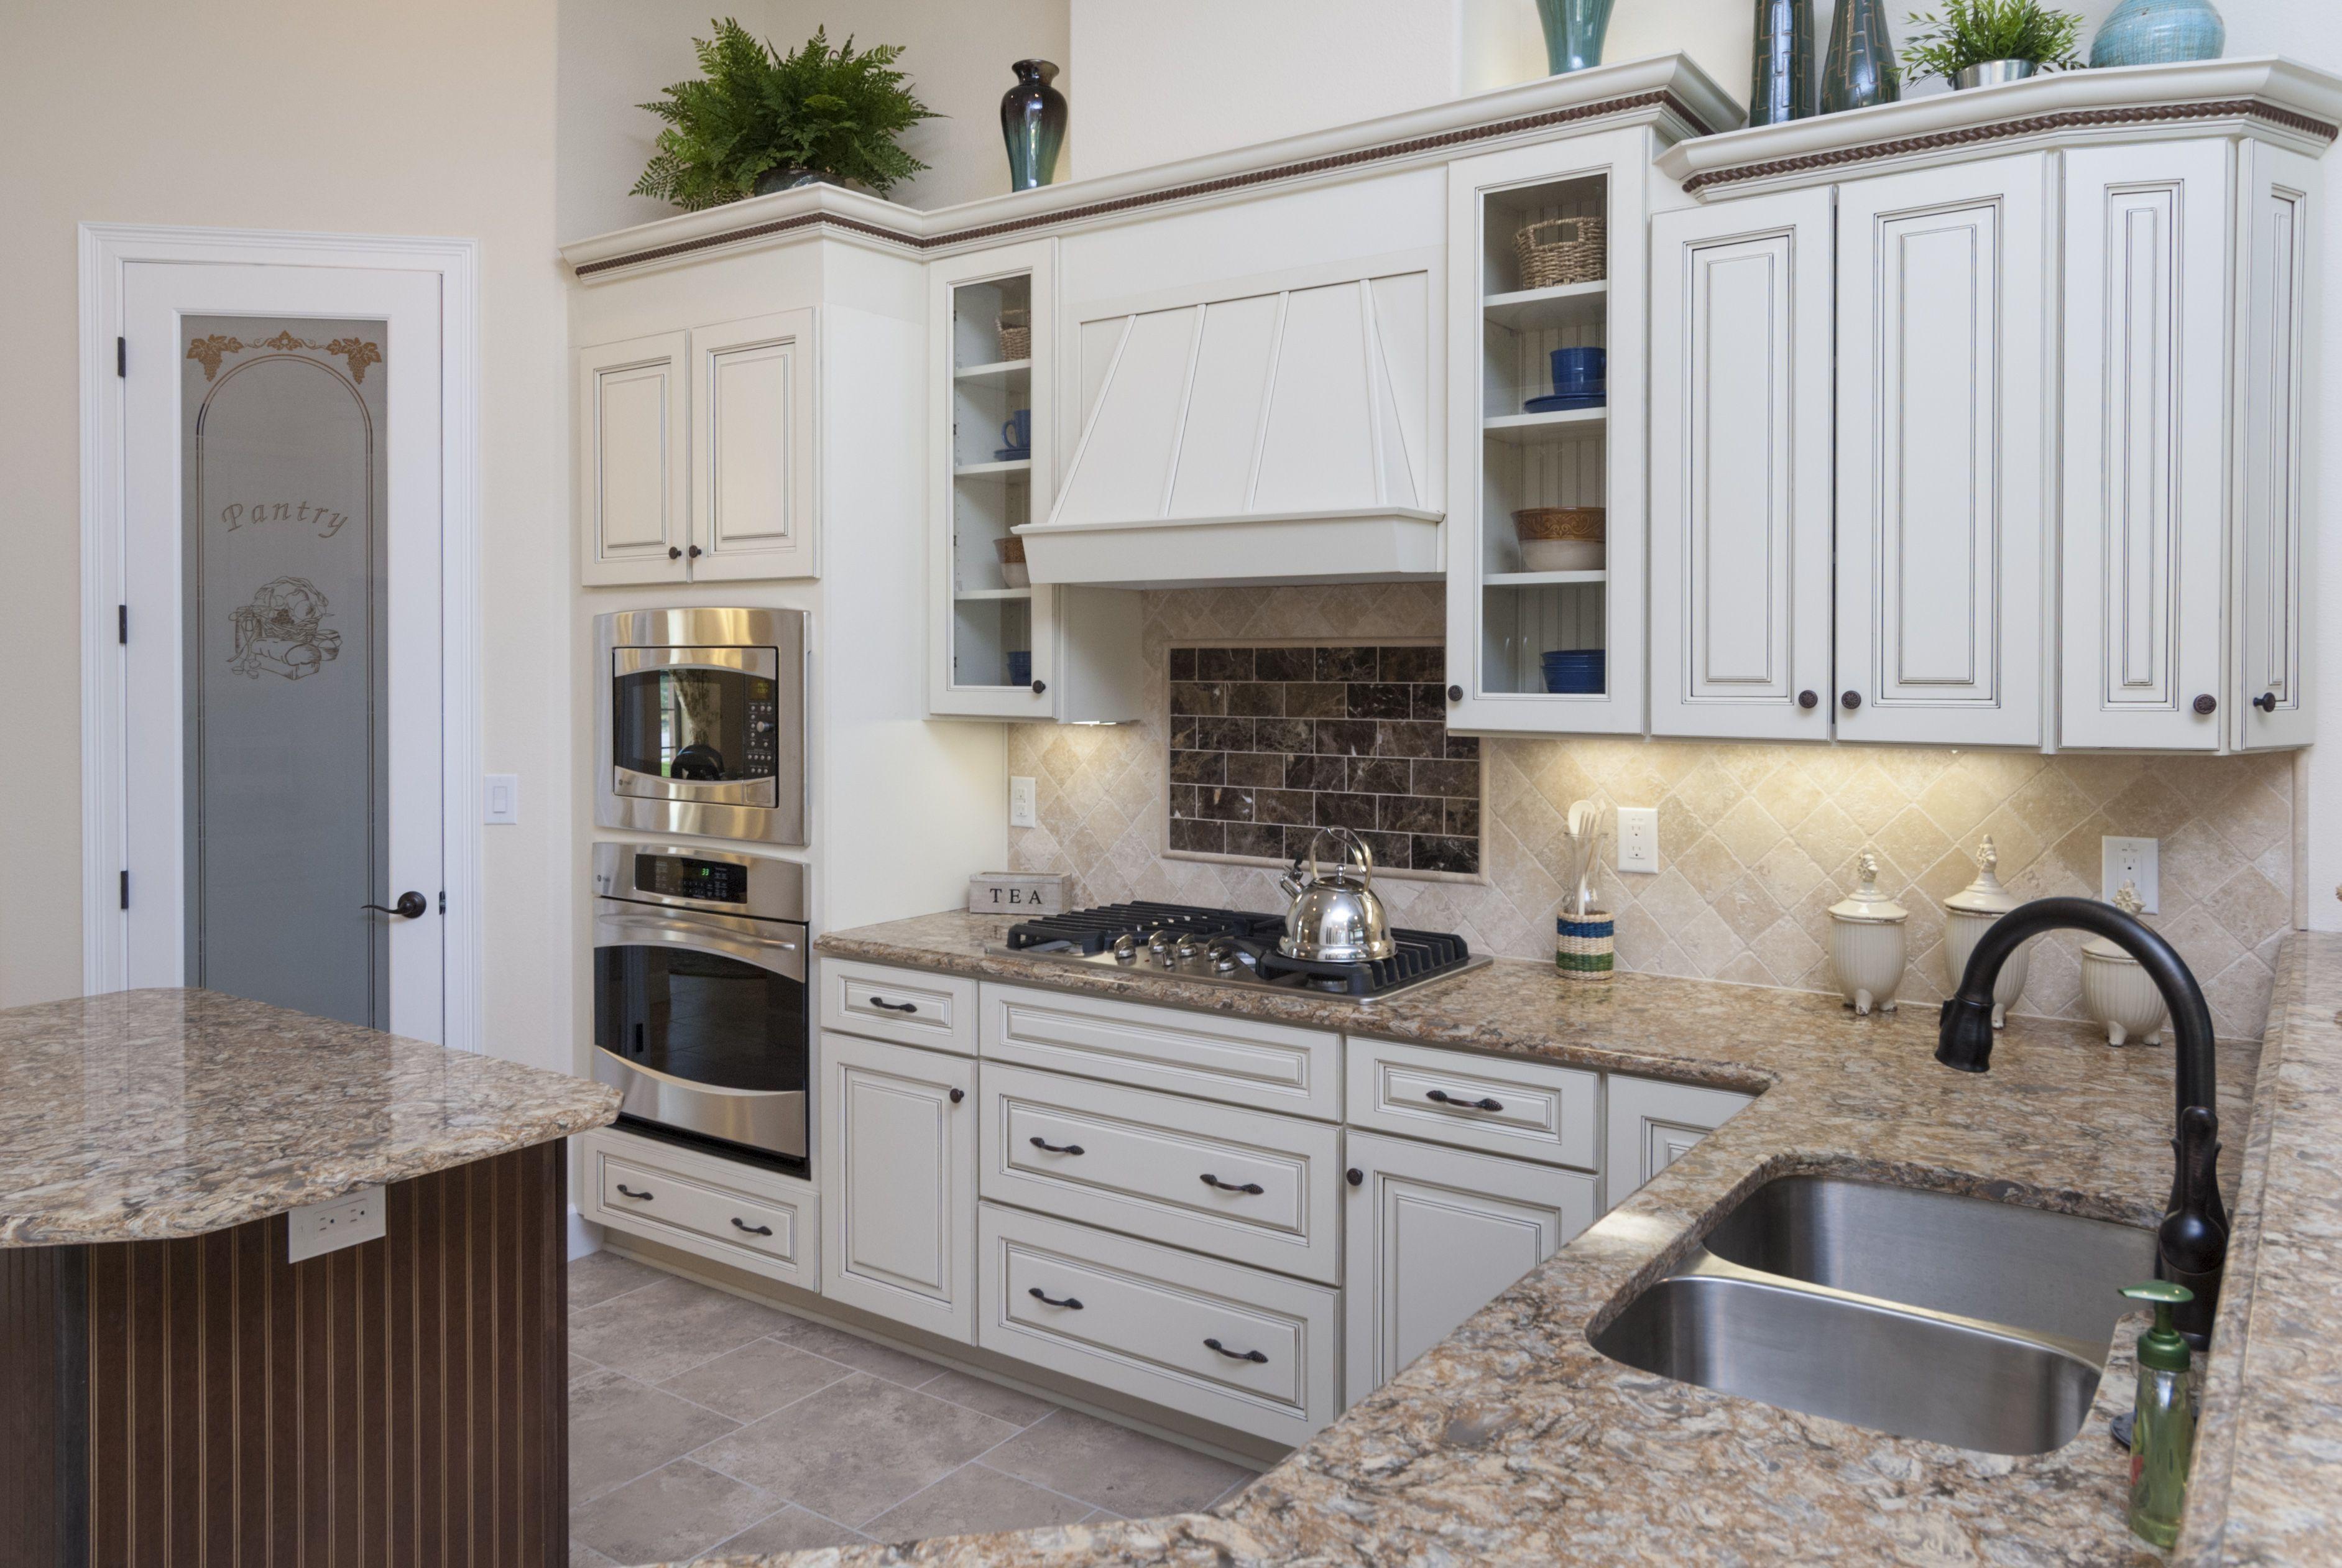 321 684 7761 Www Stanleyhomesinc Com Home Custom Kitchens Home Construction